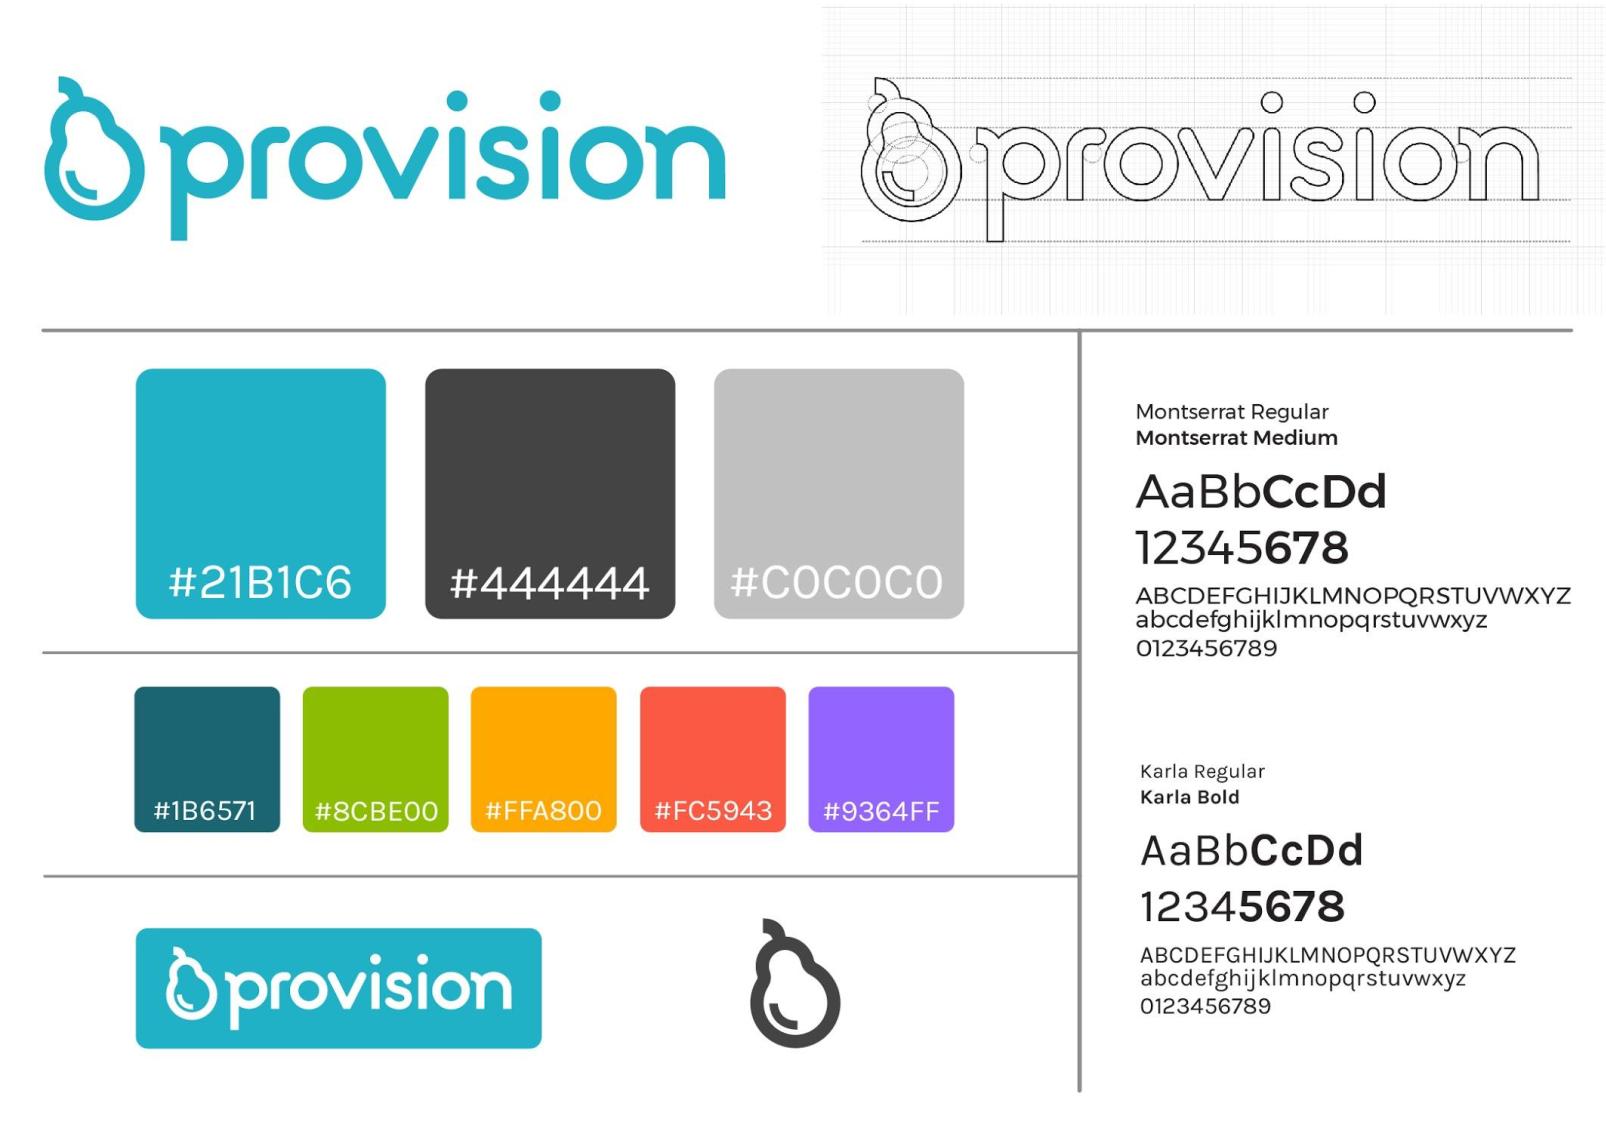 Provision_Visual Identity.png